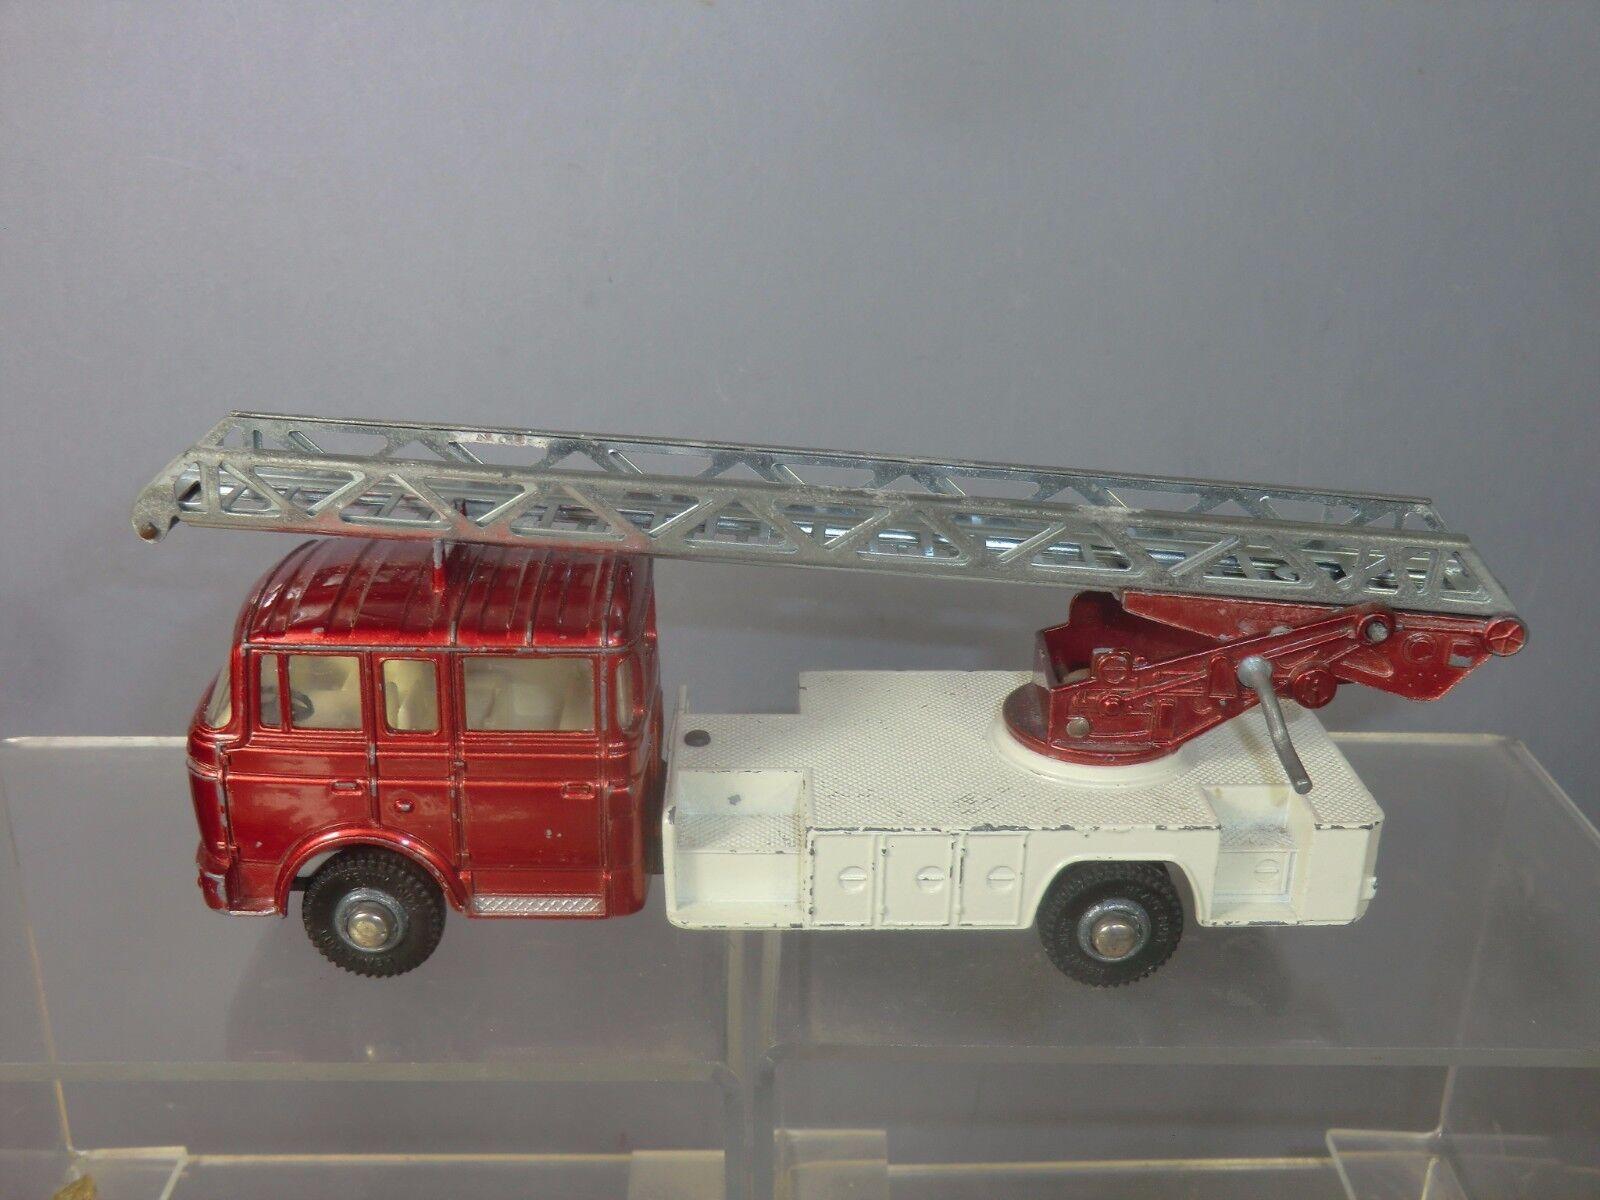 Schäbiges supervibros modell no.956 berliet drehscheibe feuerleiter